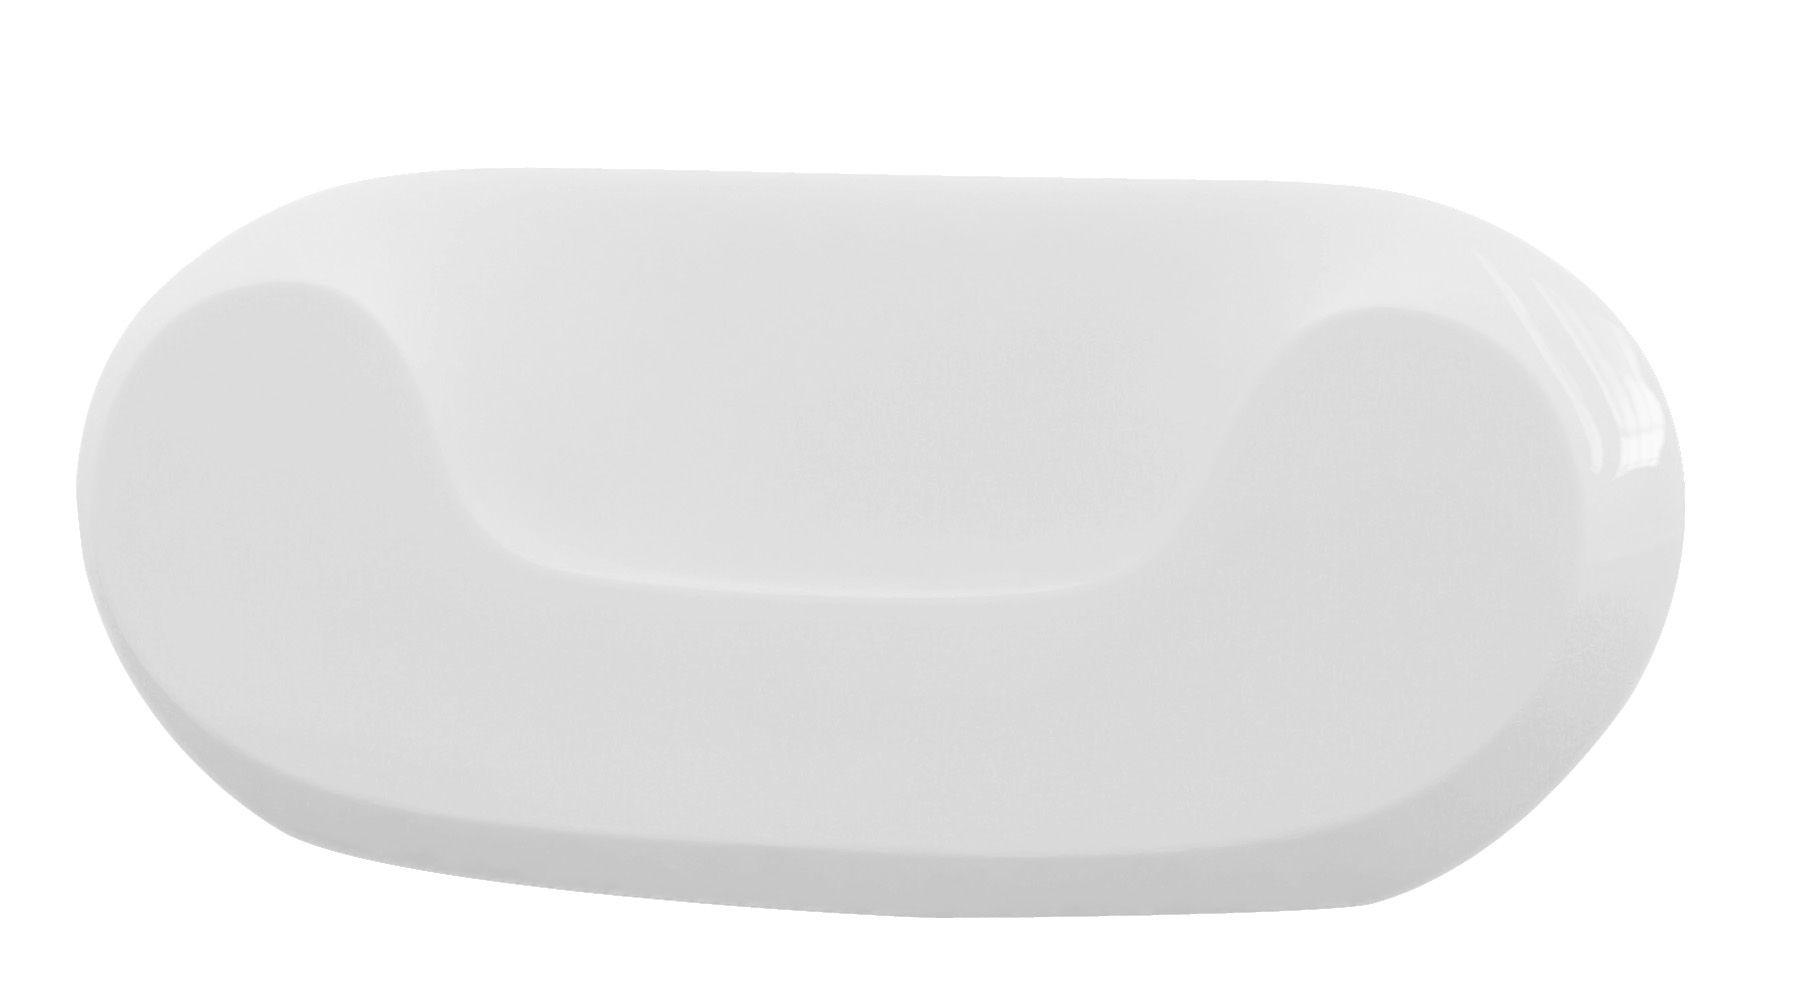 Möbel - Möbel für Teens - Chubby Lounge Sessel lackiert - Slide - Weiß lackiert - Polyéthylène recyclable laqué